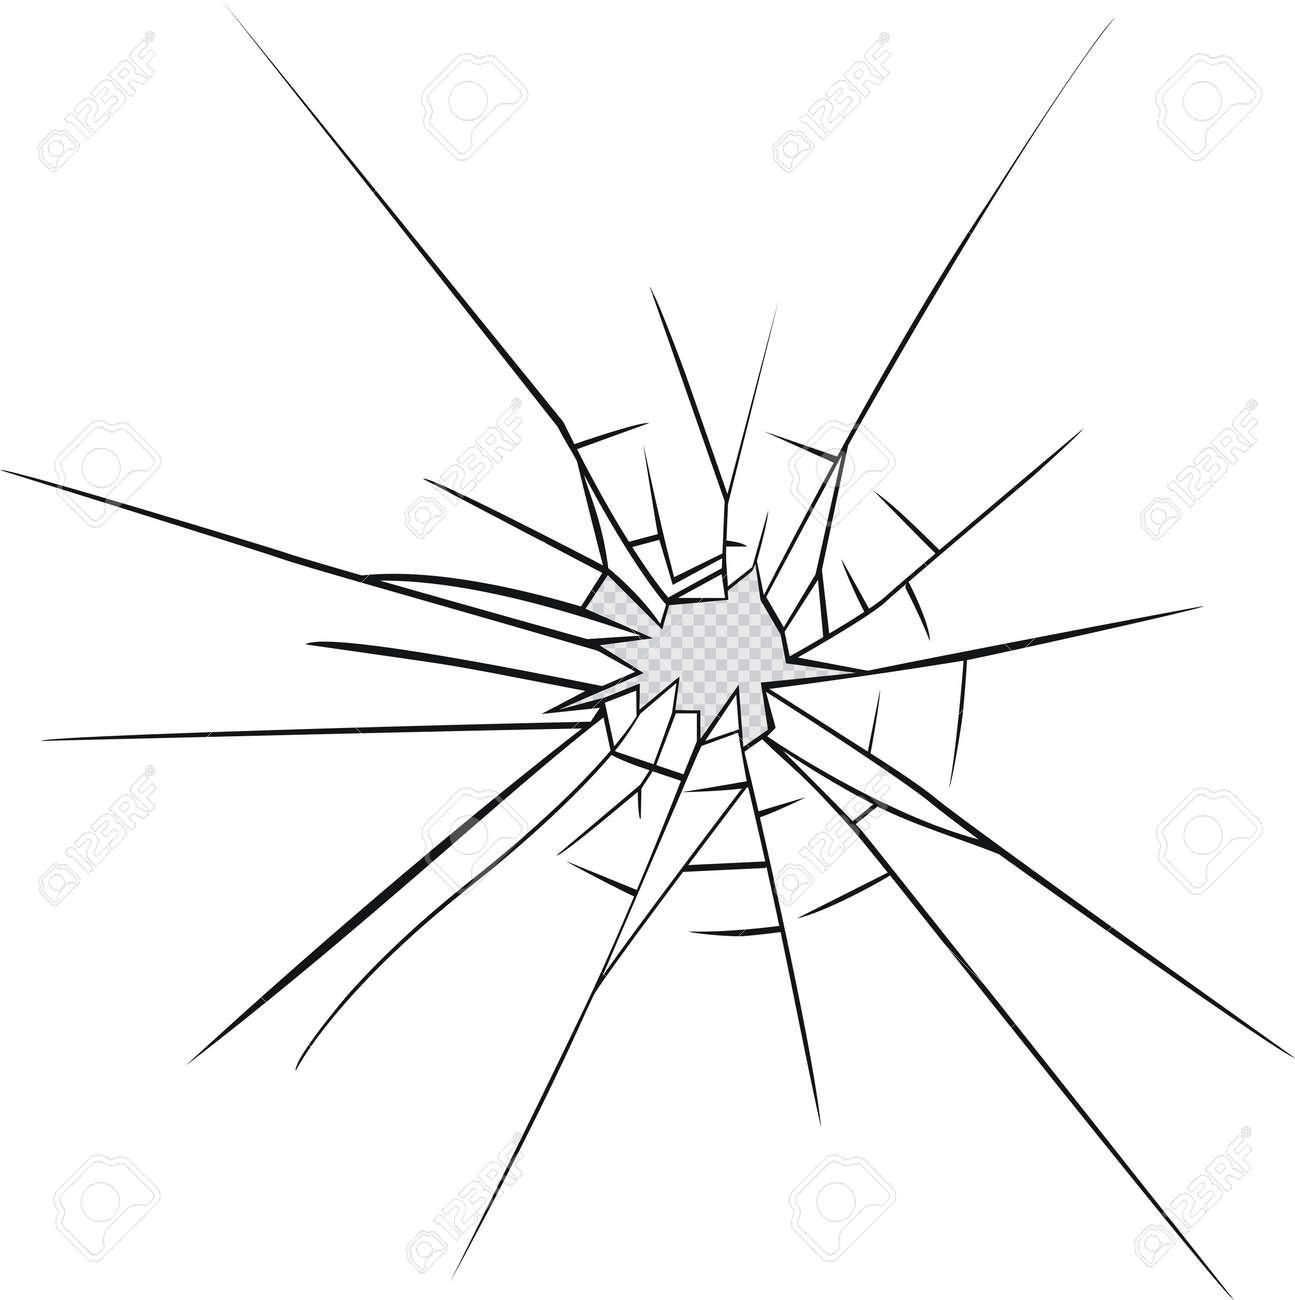 broken glass effect hole in the broken glass vector illustration rh 123rf com broken glass victorious chords broken glass vector art